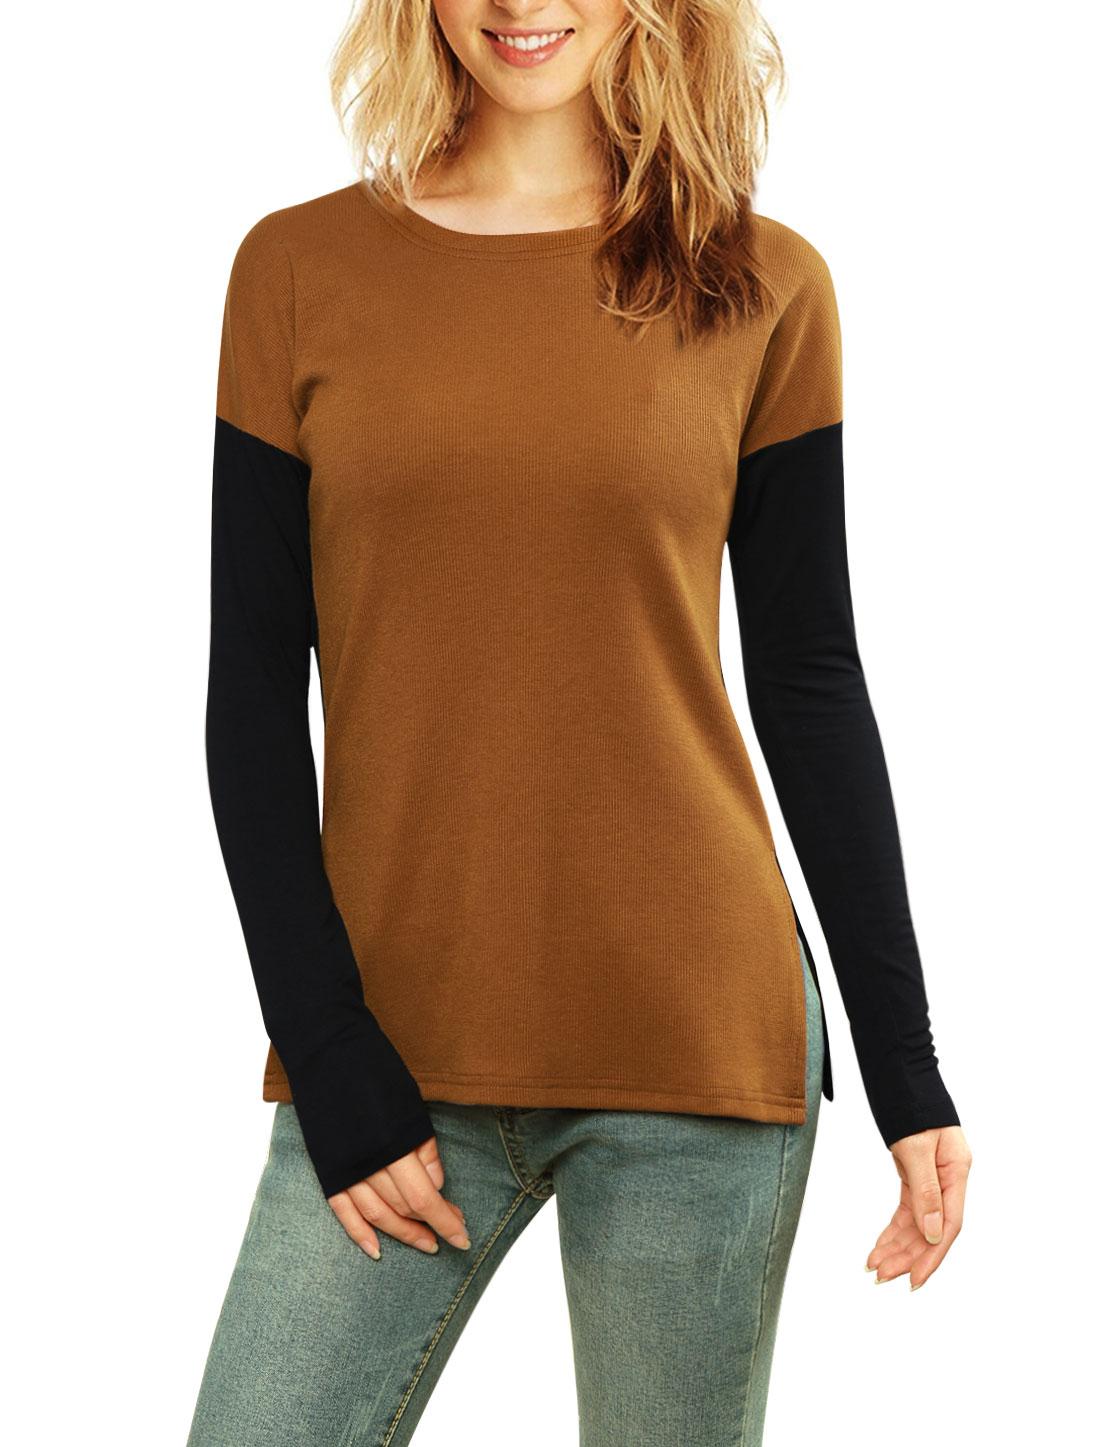 Women Color Block Side-Slit Paneled Slim Fit Ribbed Top Brown S